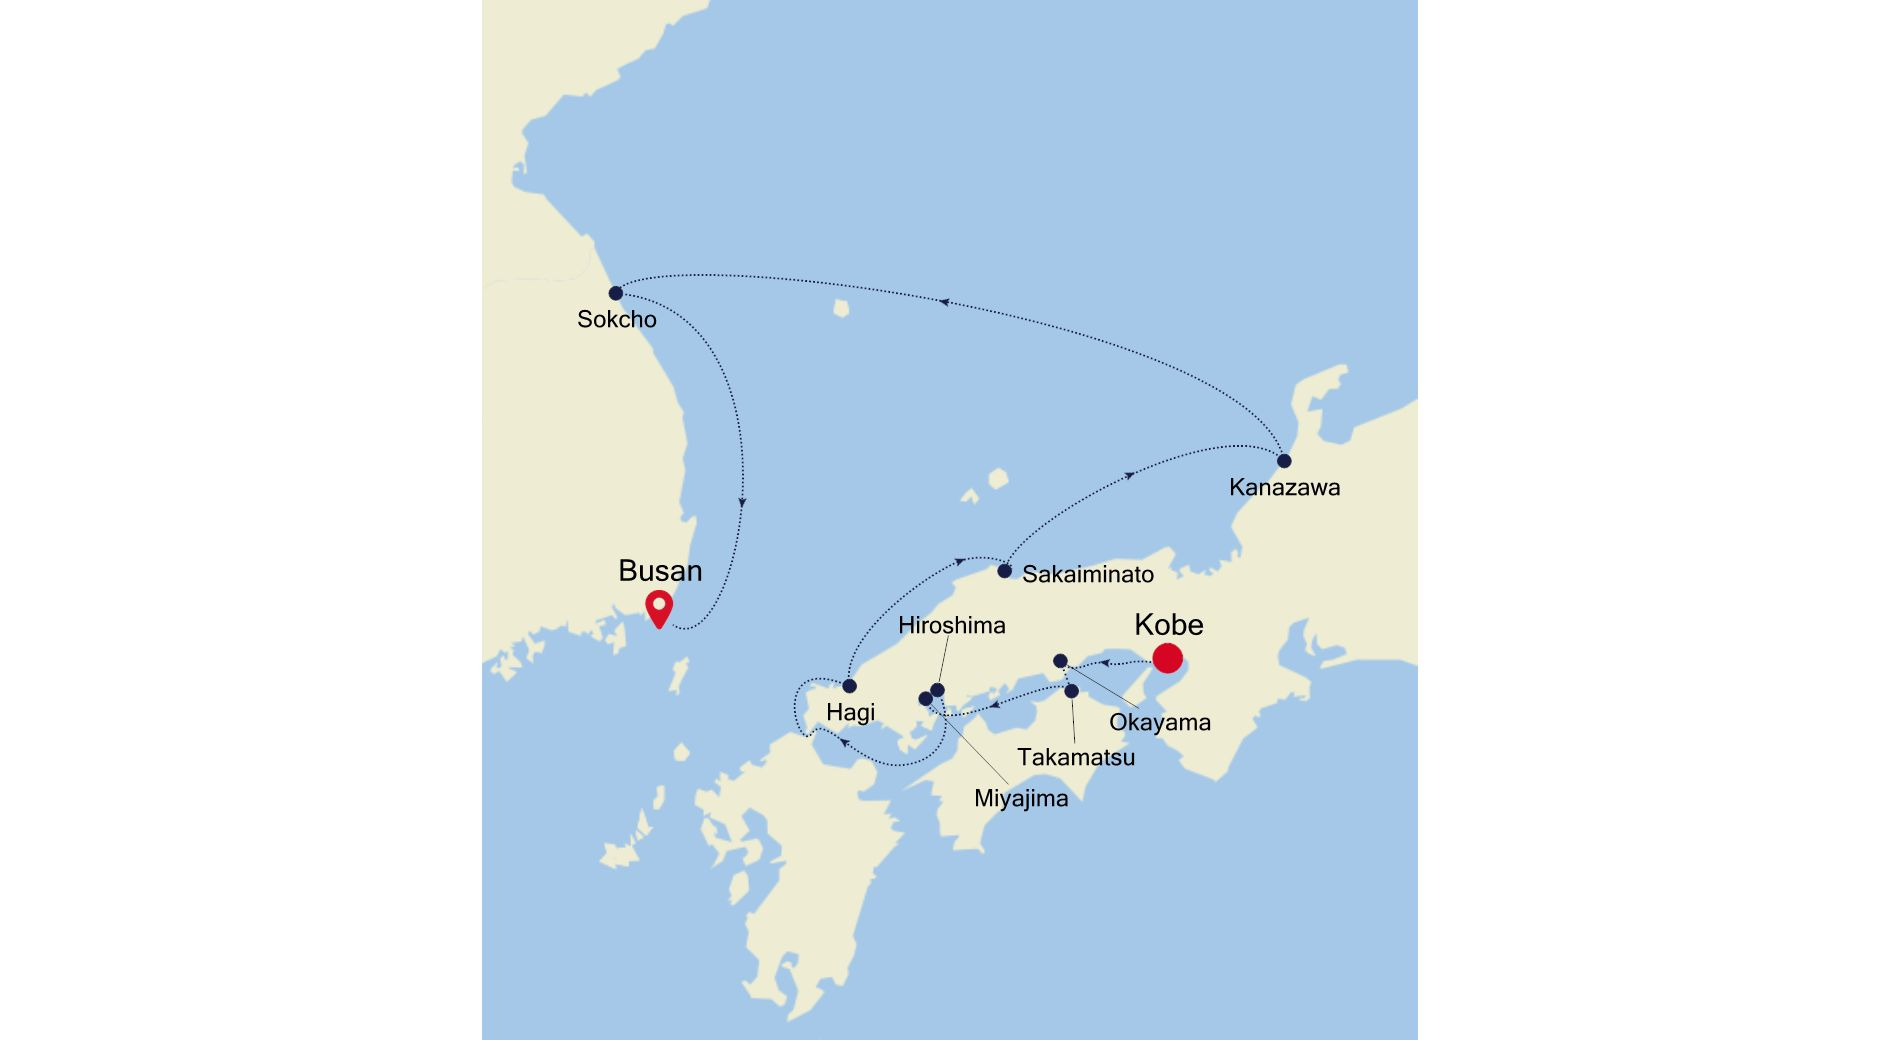 7910 - Kobe  nach Busan